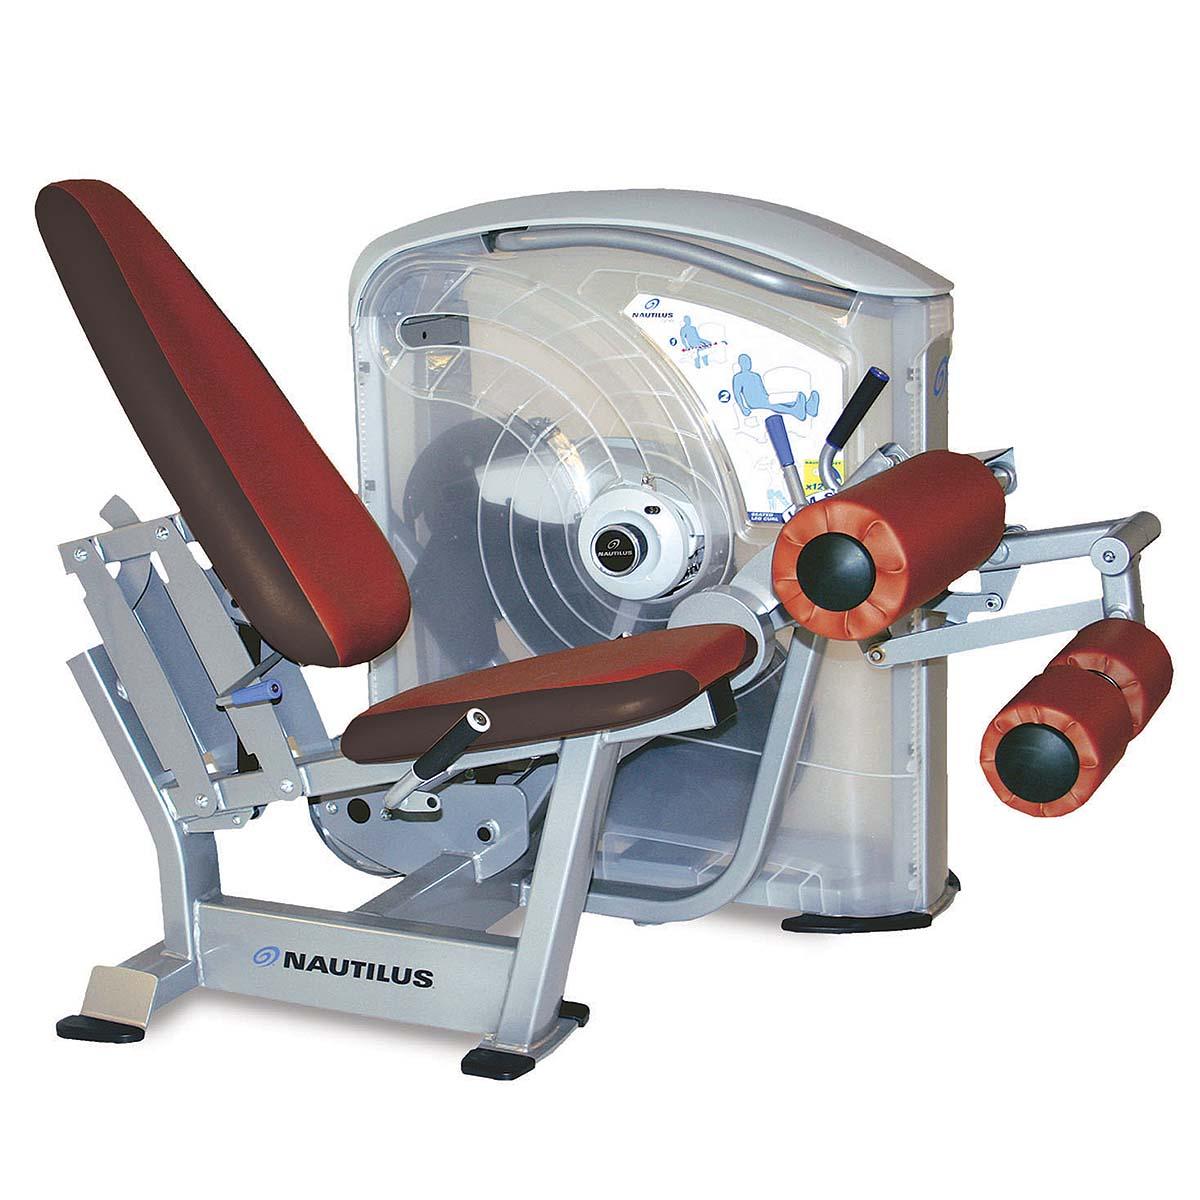 Vancouver Strength Equipment - Nautilus One Series - Lifestyle Equipment